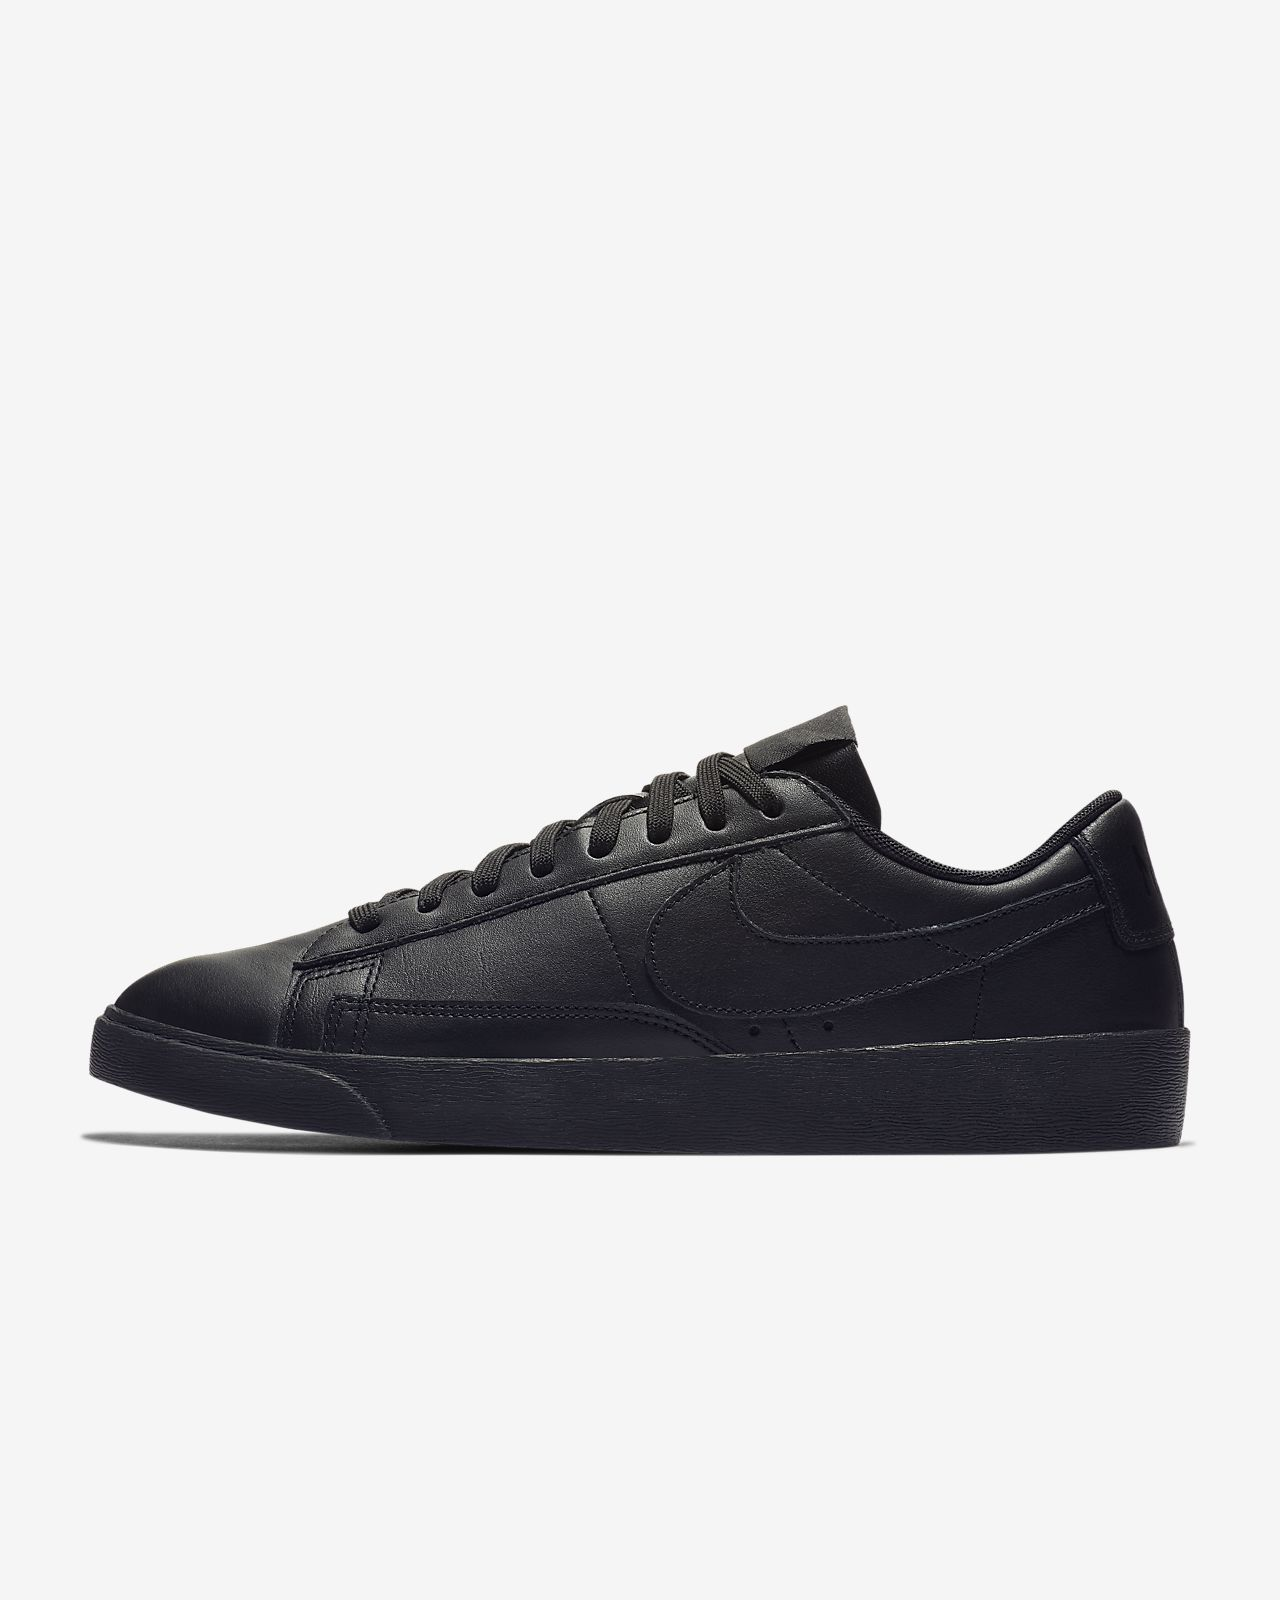 buy popular 6393d 49e18 ... Sko Nike Blazer Low LE för kvinnor